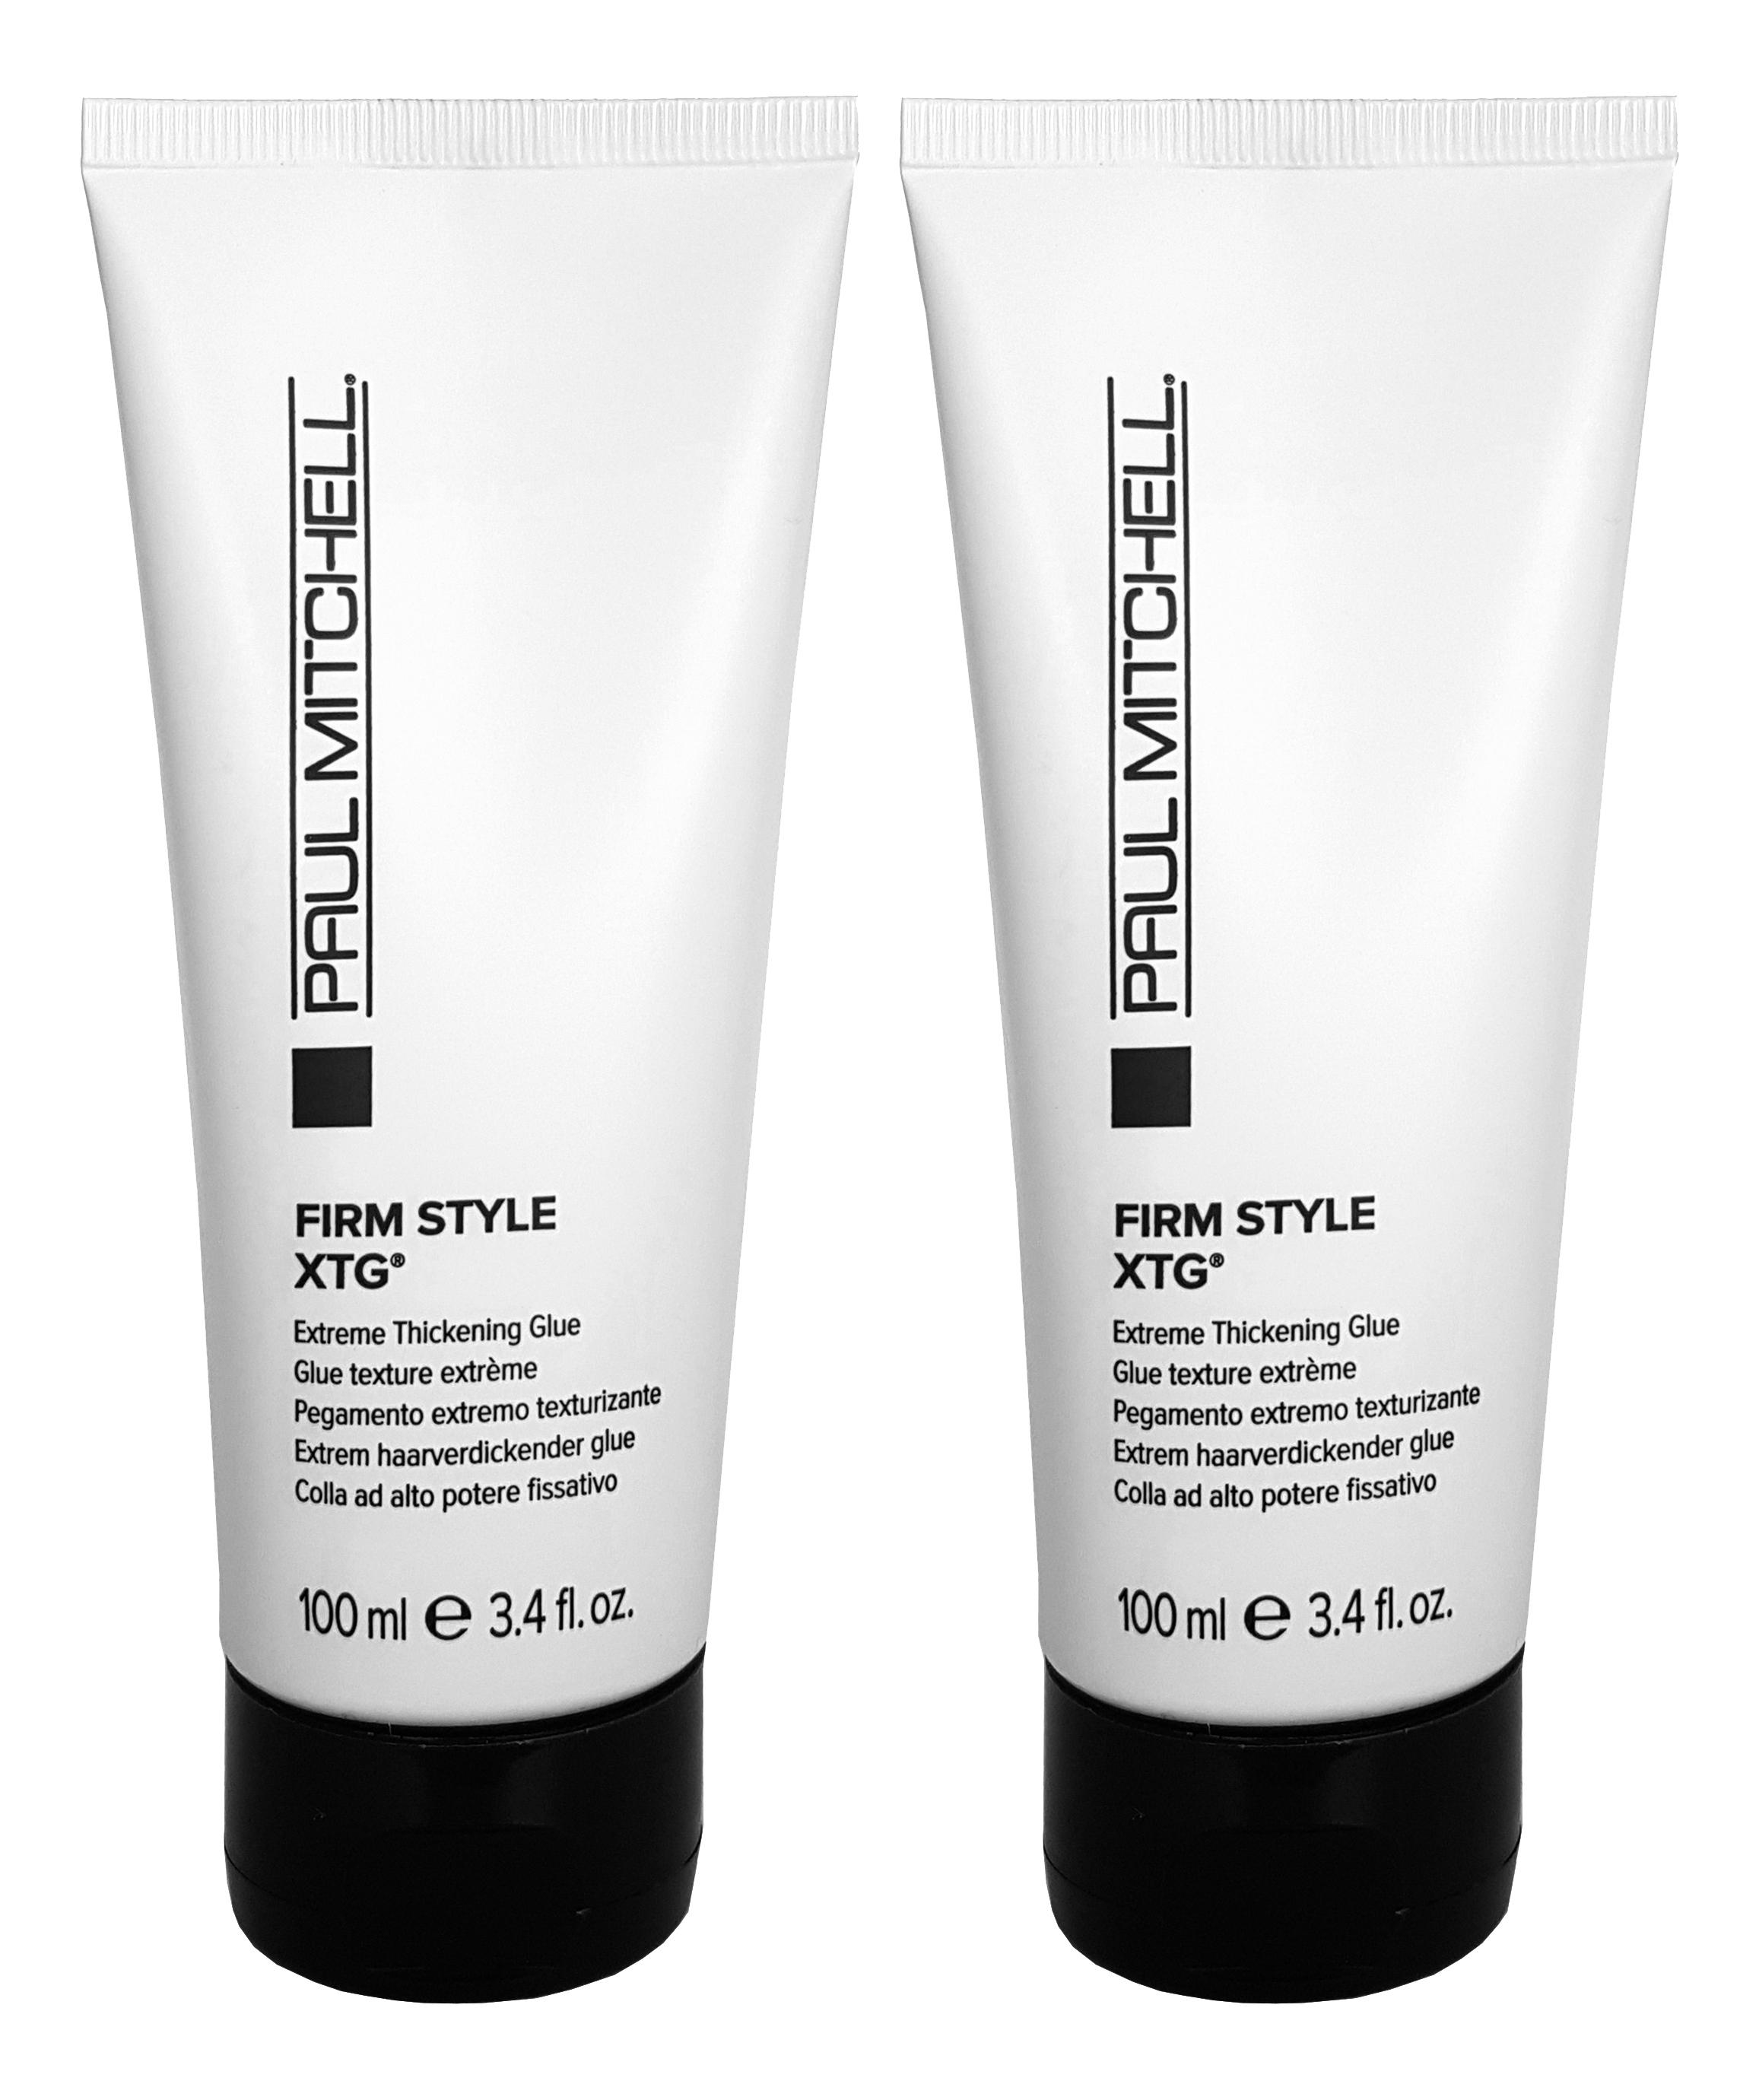 Paul Mitchell Firm Style XTG Extreme Thickening Glue 2x100ml = 200ml